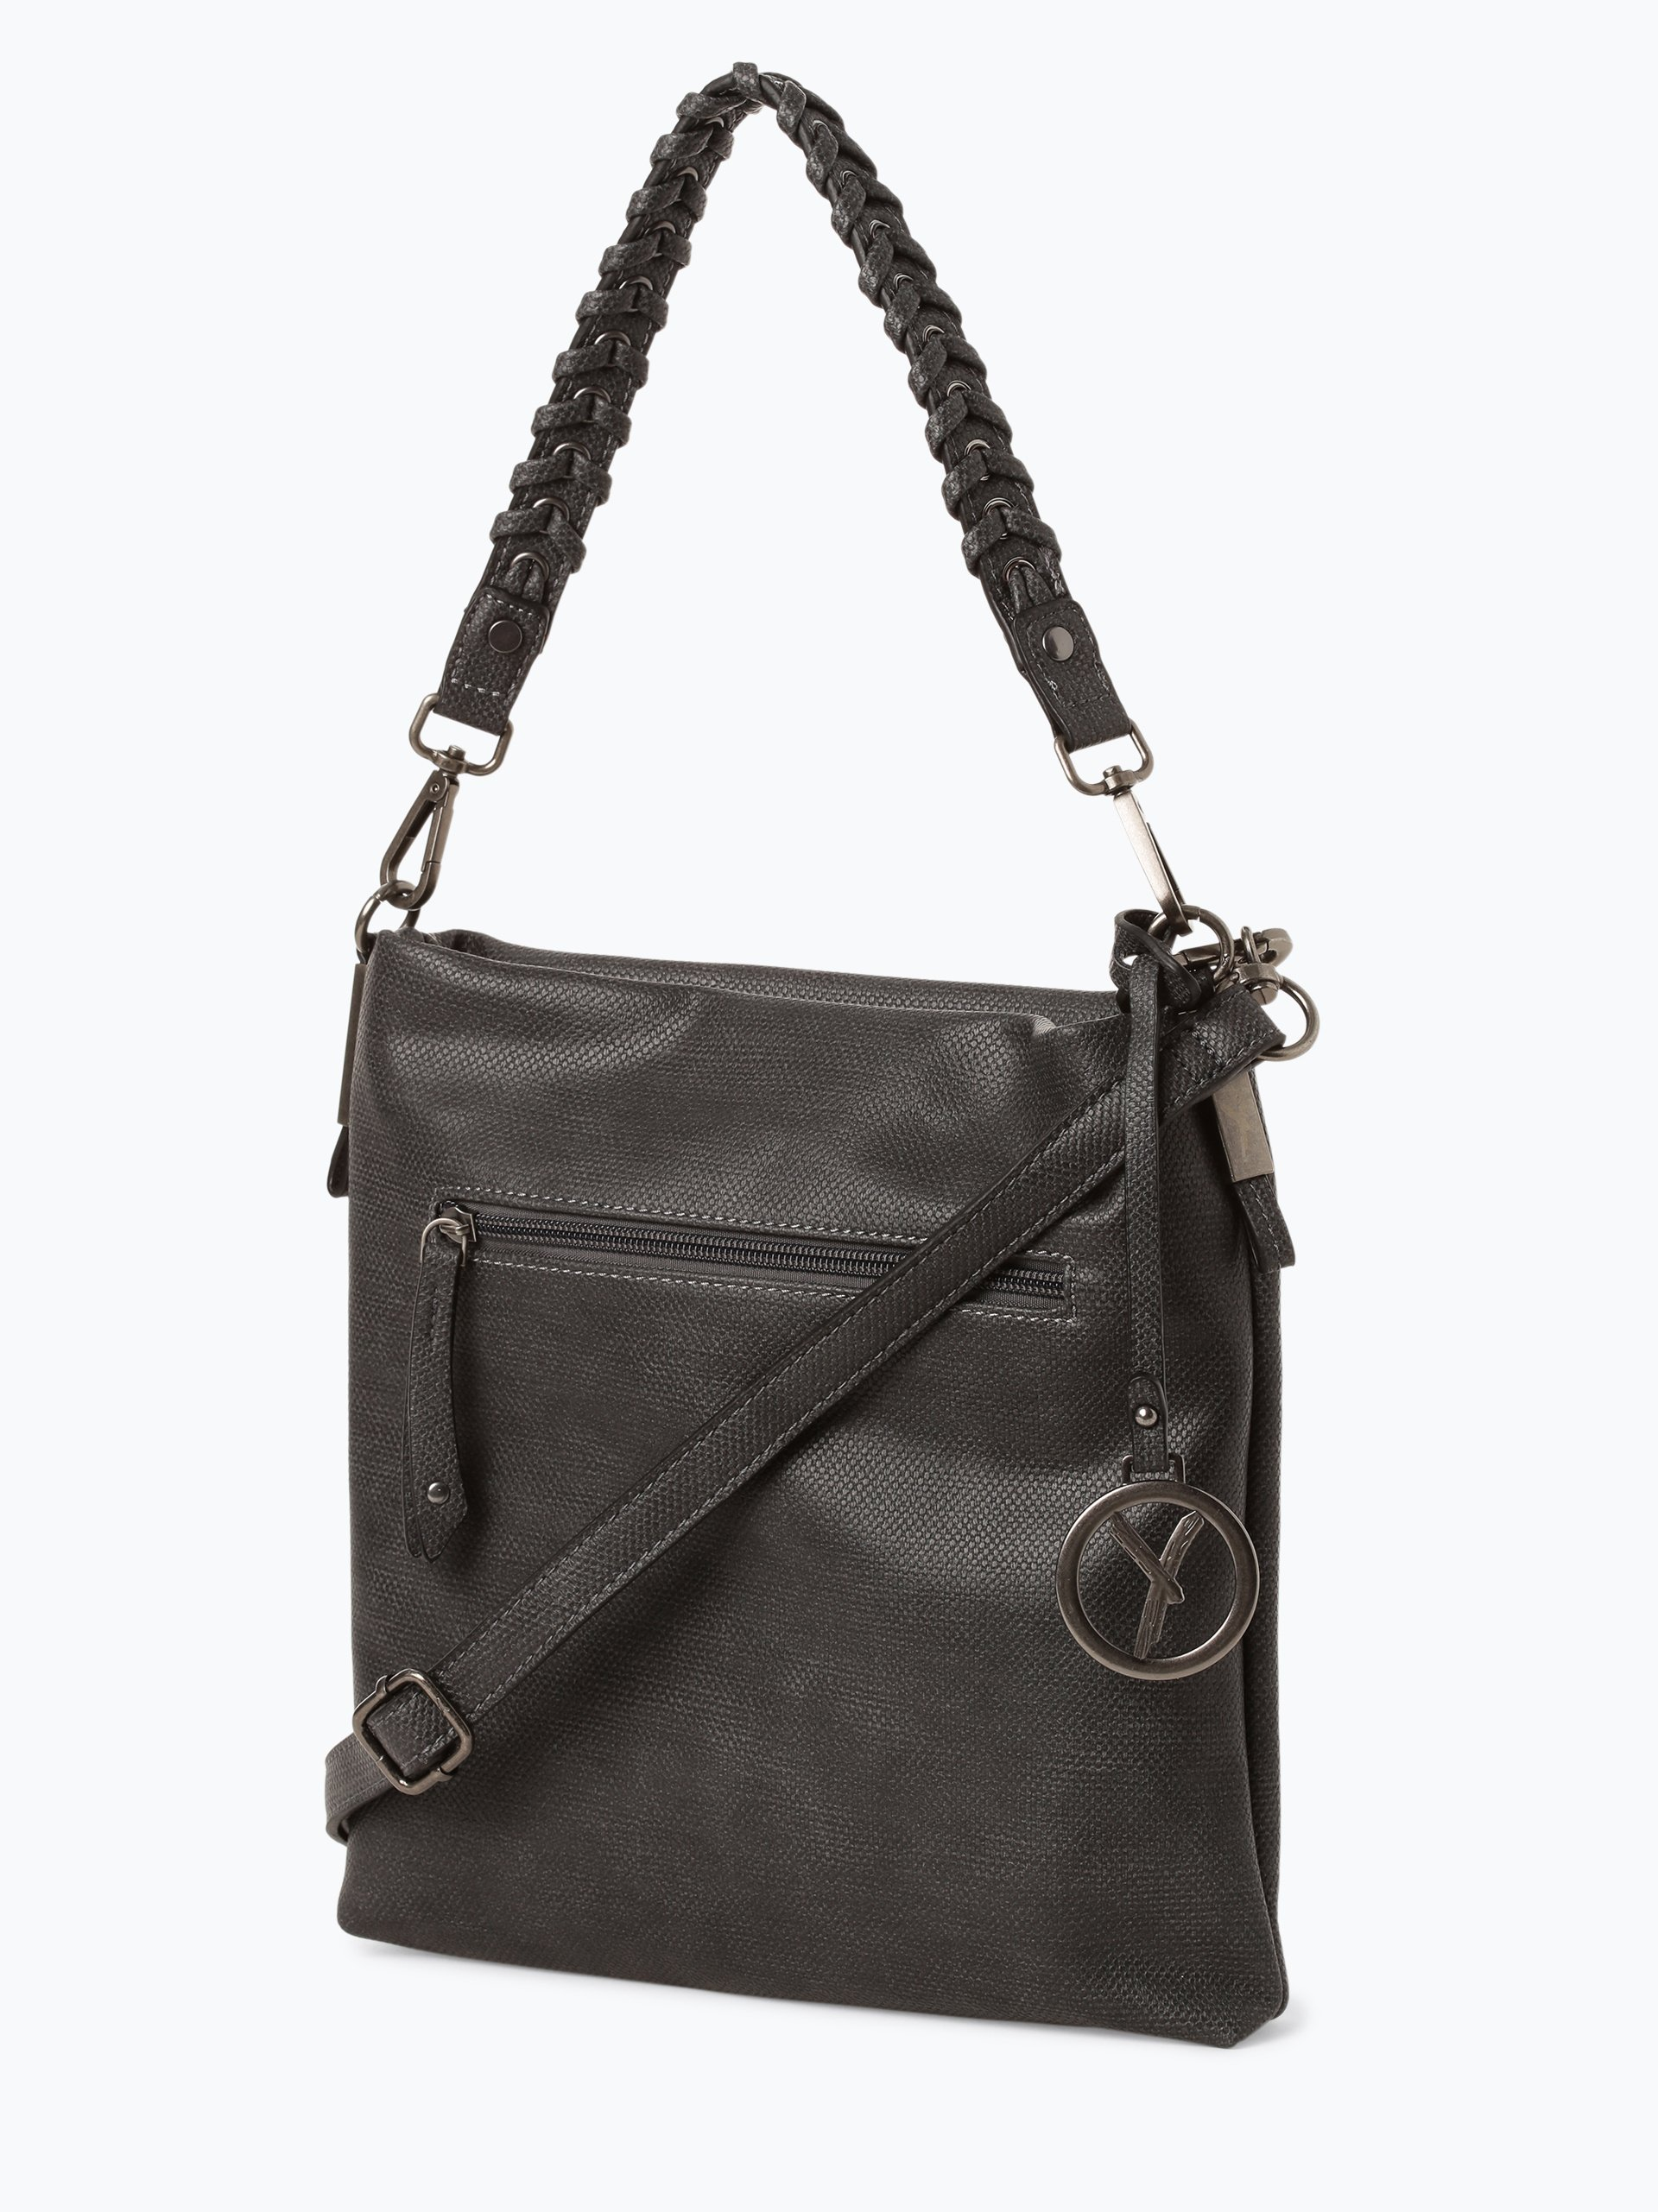 Suri Frey Damen Handtasche - Kimberly